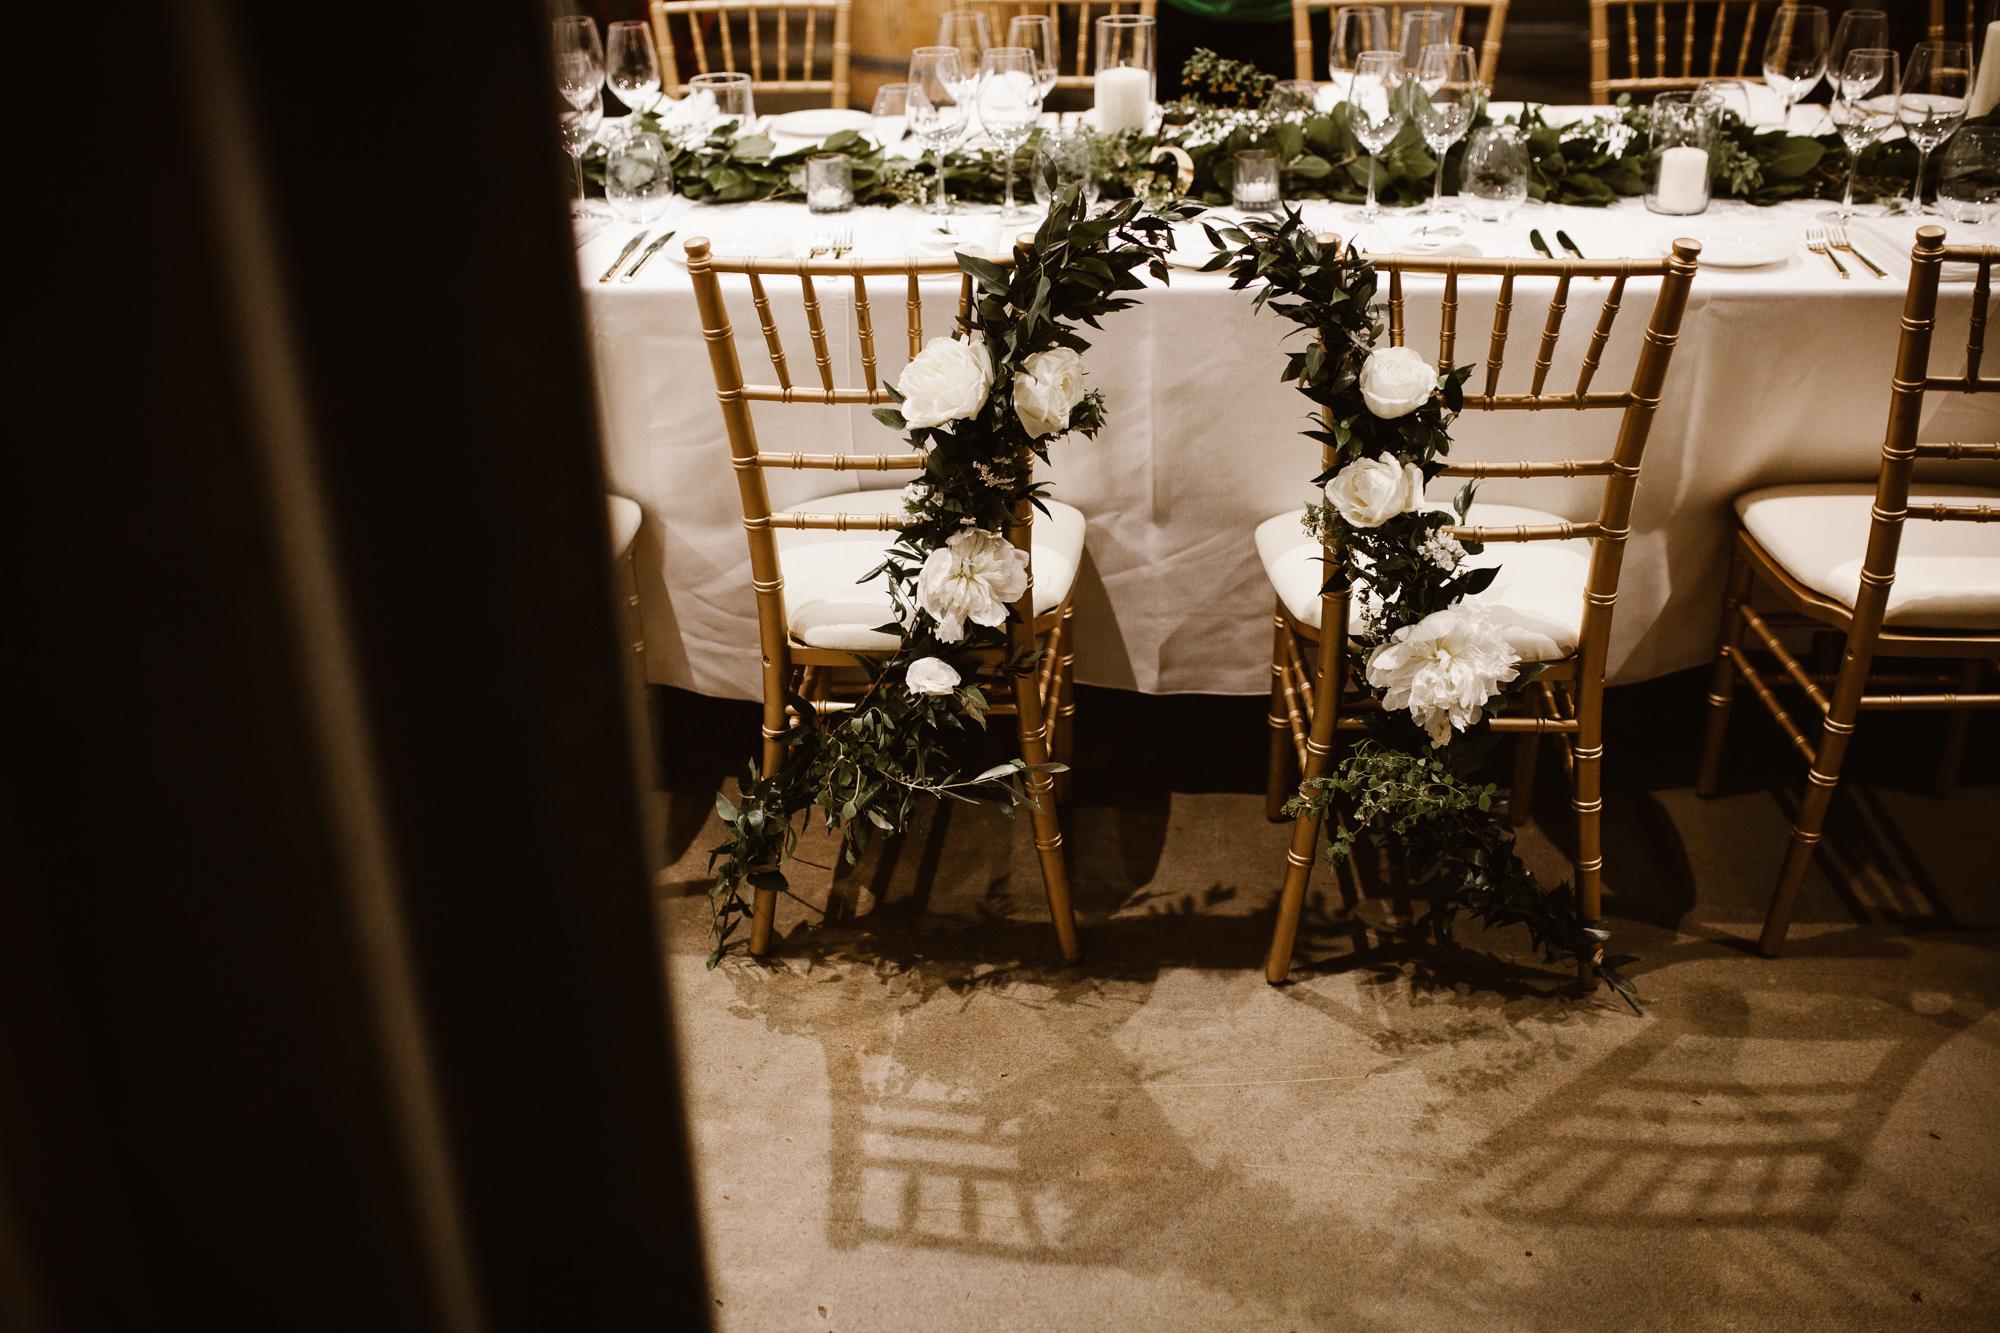 stratus-winery-wedding-vineyard-wedding-vineyard-bride-photo-by-reed-photography-046.jpg